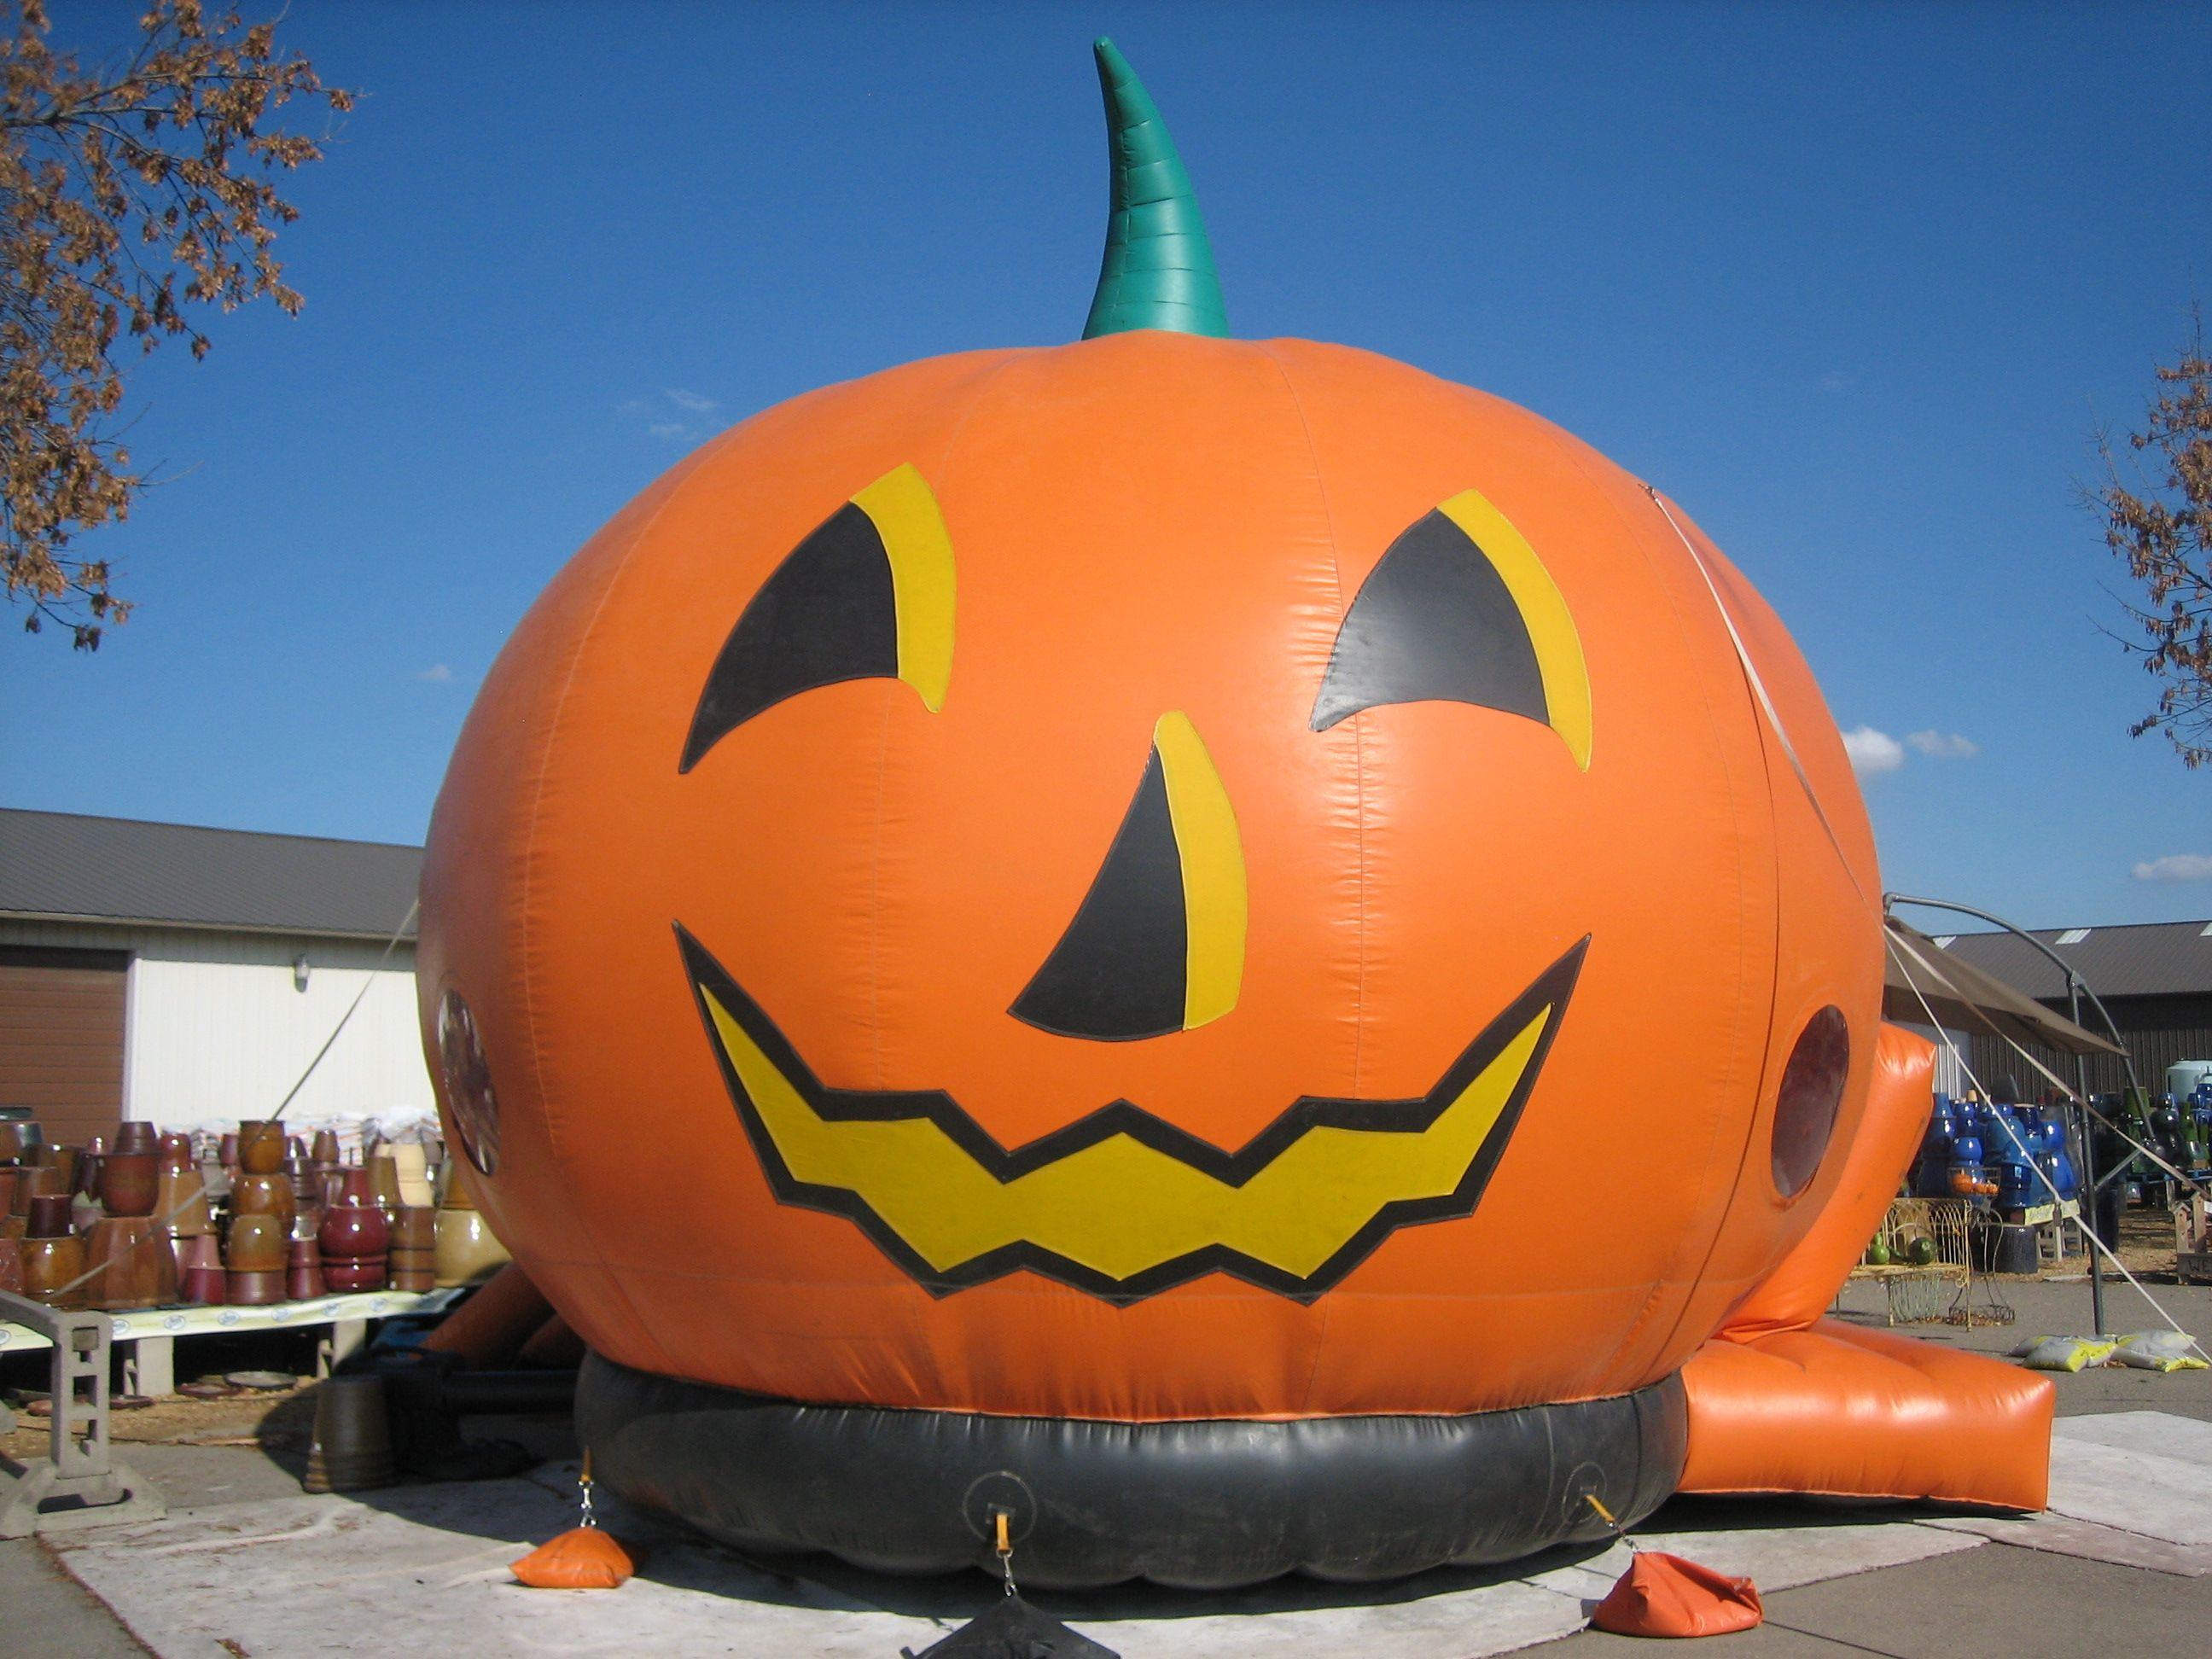 The kids love Pahl's Bouncy Pumpkin